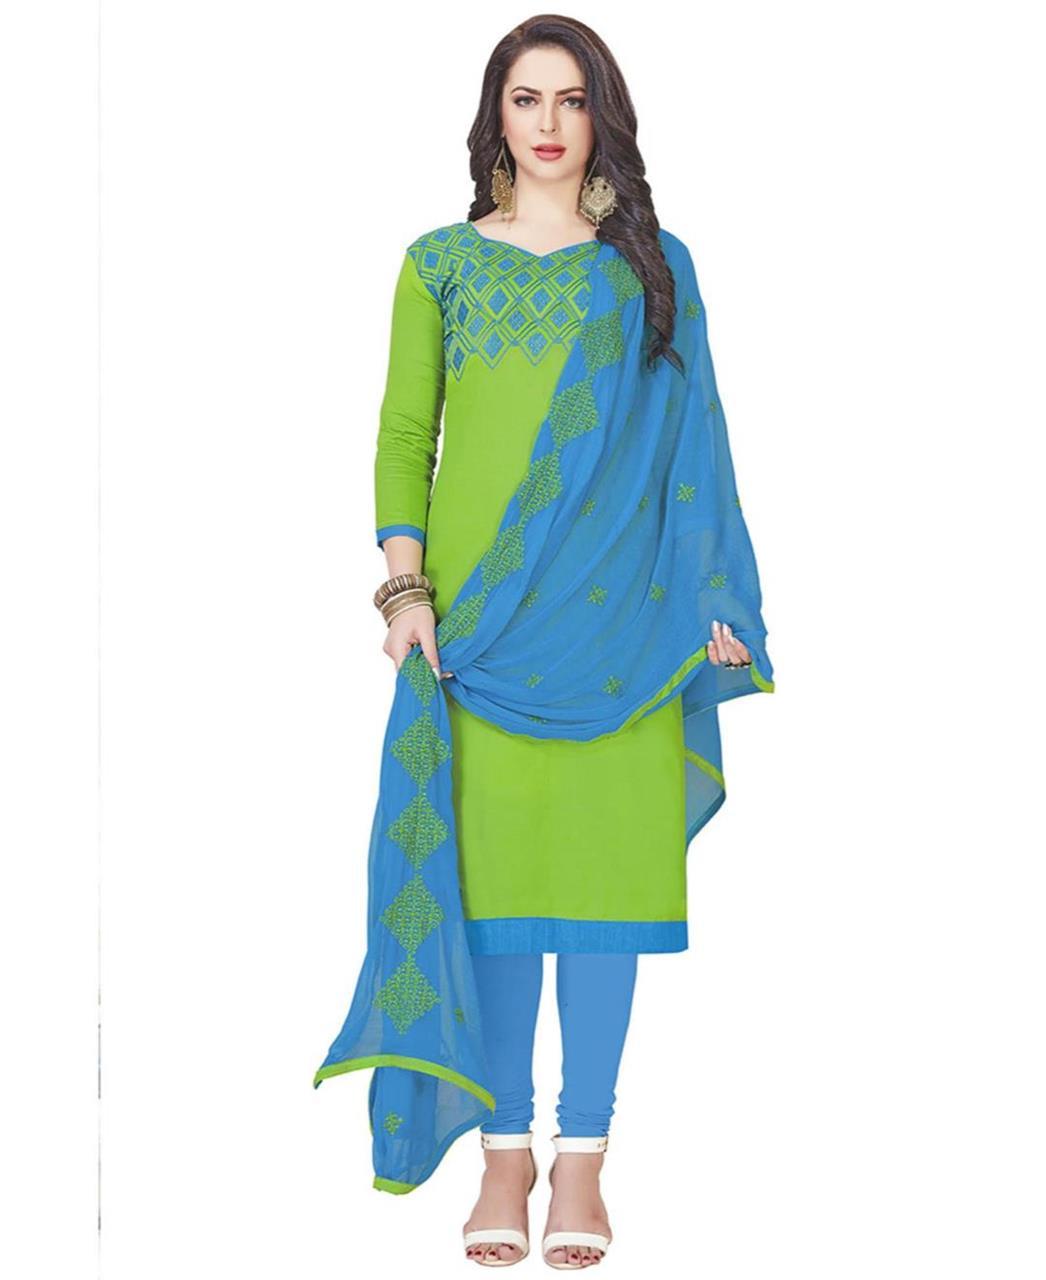 Embroidered Cotton LimeGreen Straight Cut Salwar